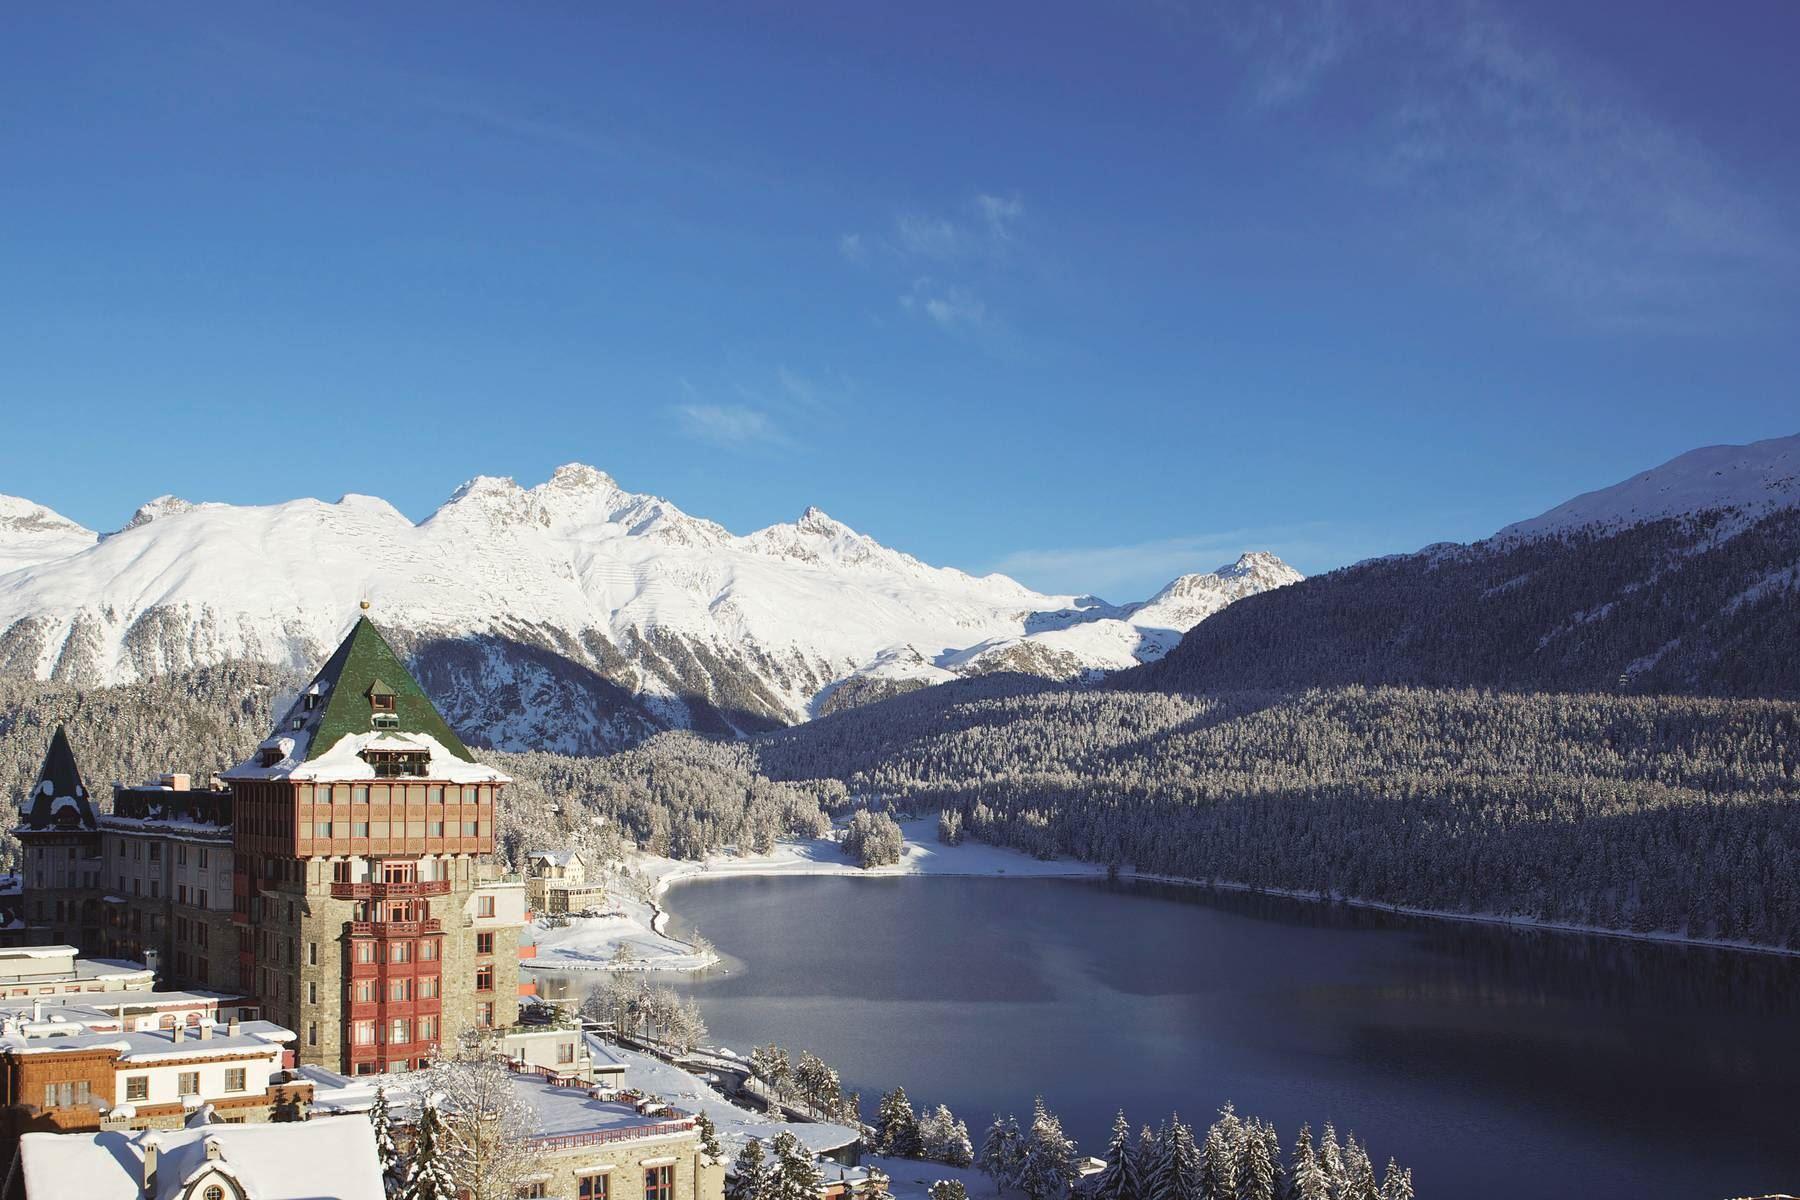 Badrutts Palace - St. Moritz